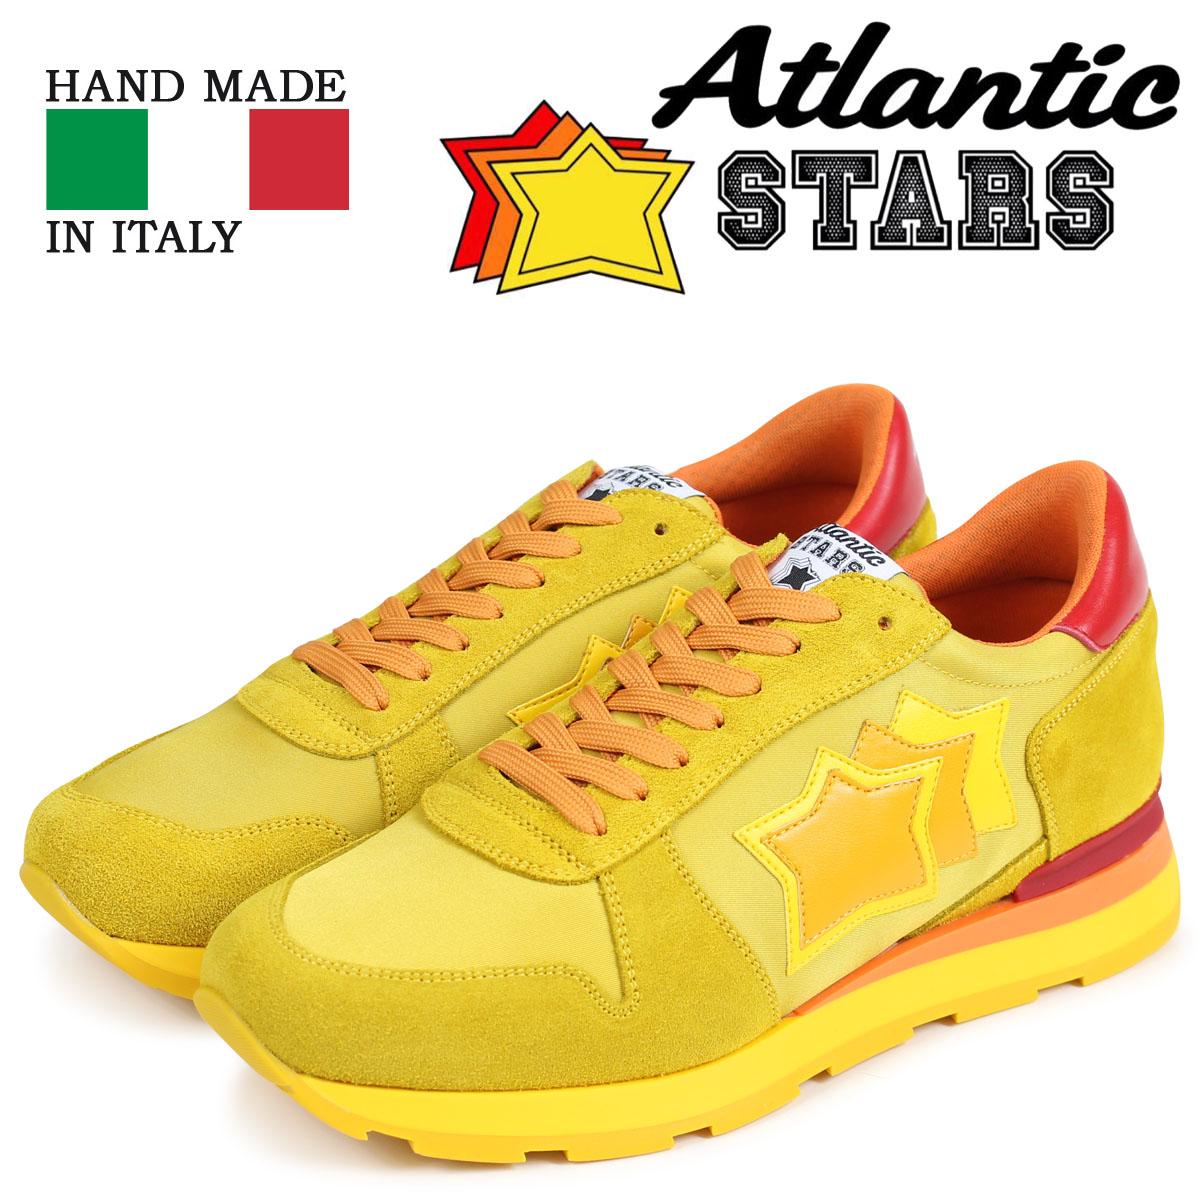 Atlantic STARS メンズ スニーカー アトランティックスターズ シリウス SIRIUS GS-46R イエロー 【決算セール 返品不可】